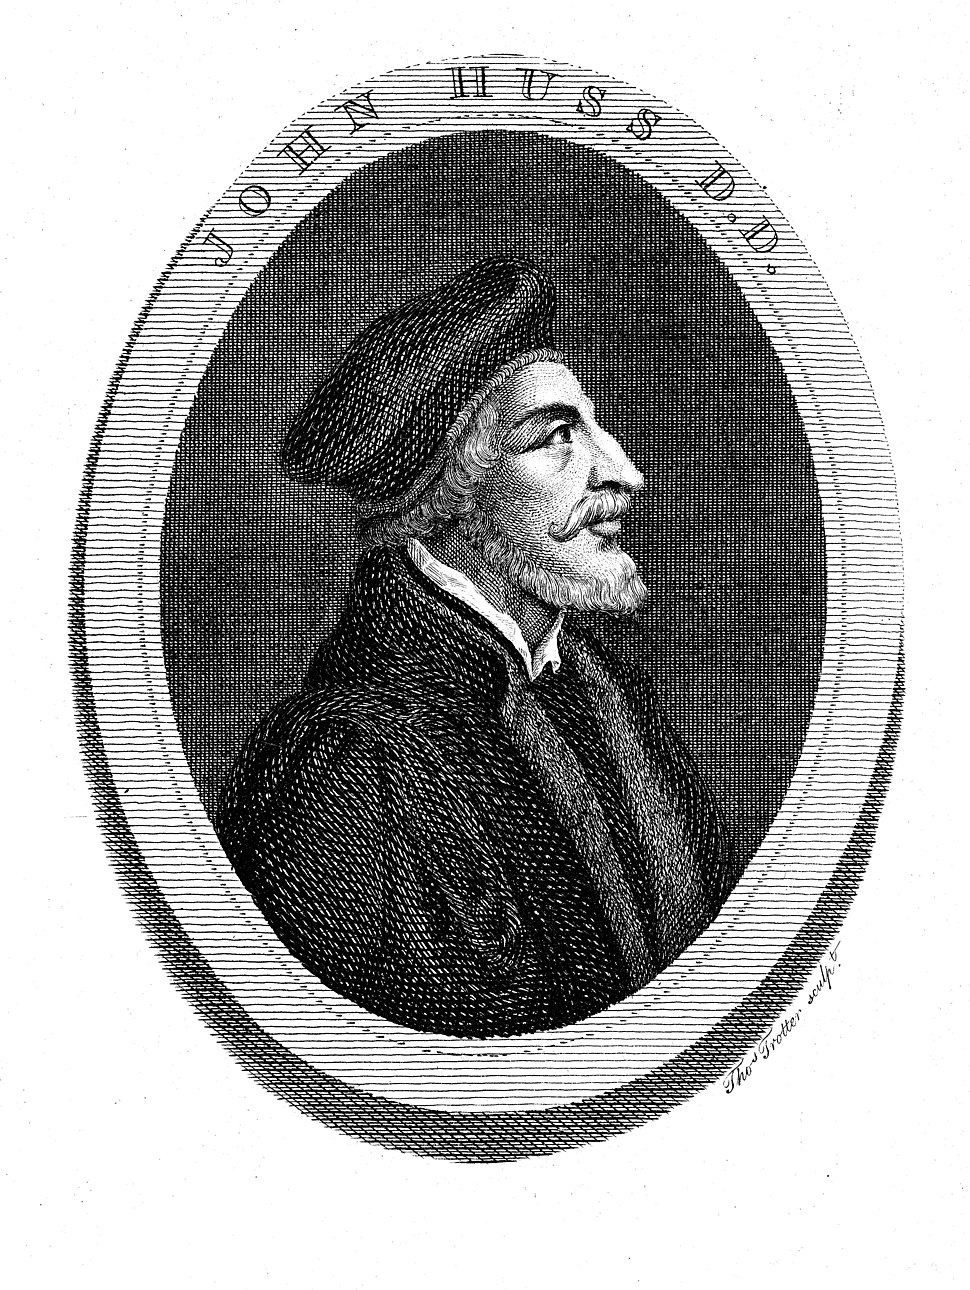 Portrait of Jan Hus